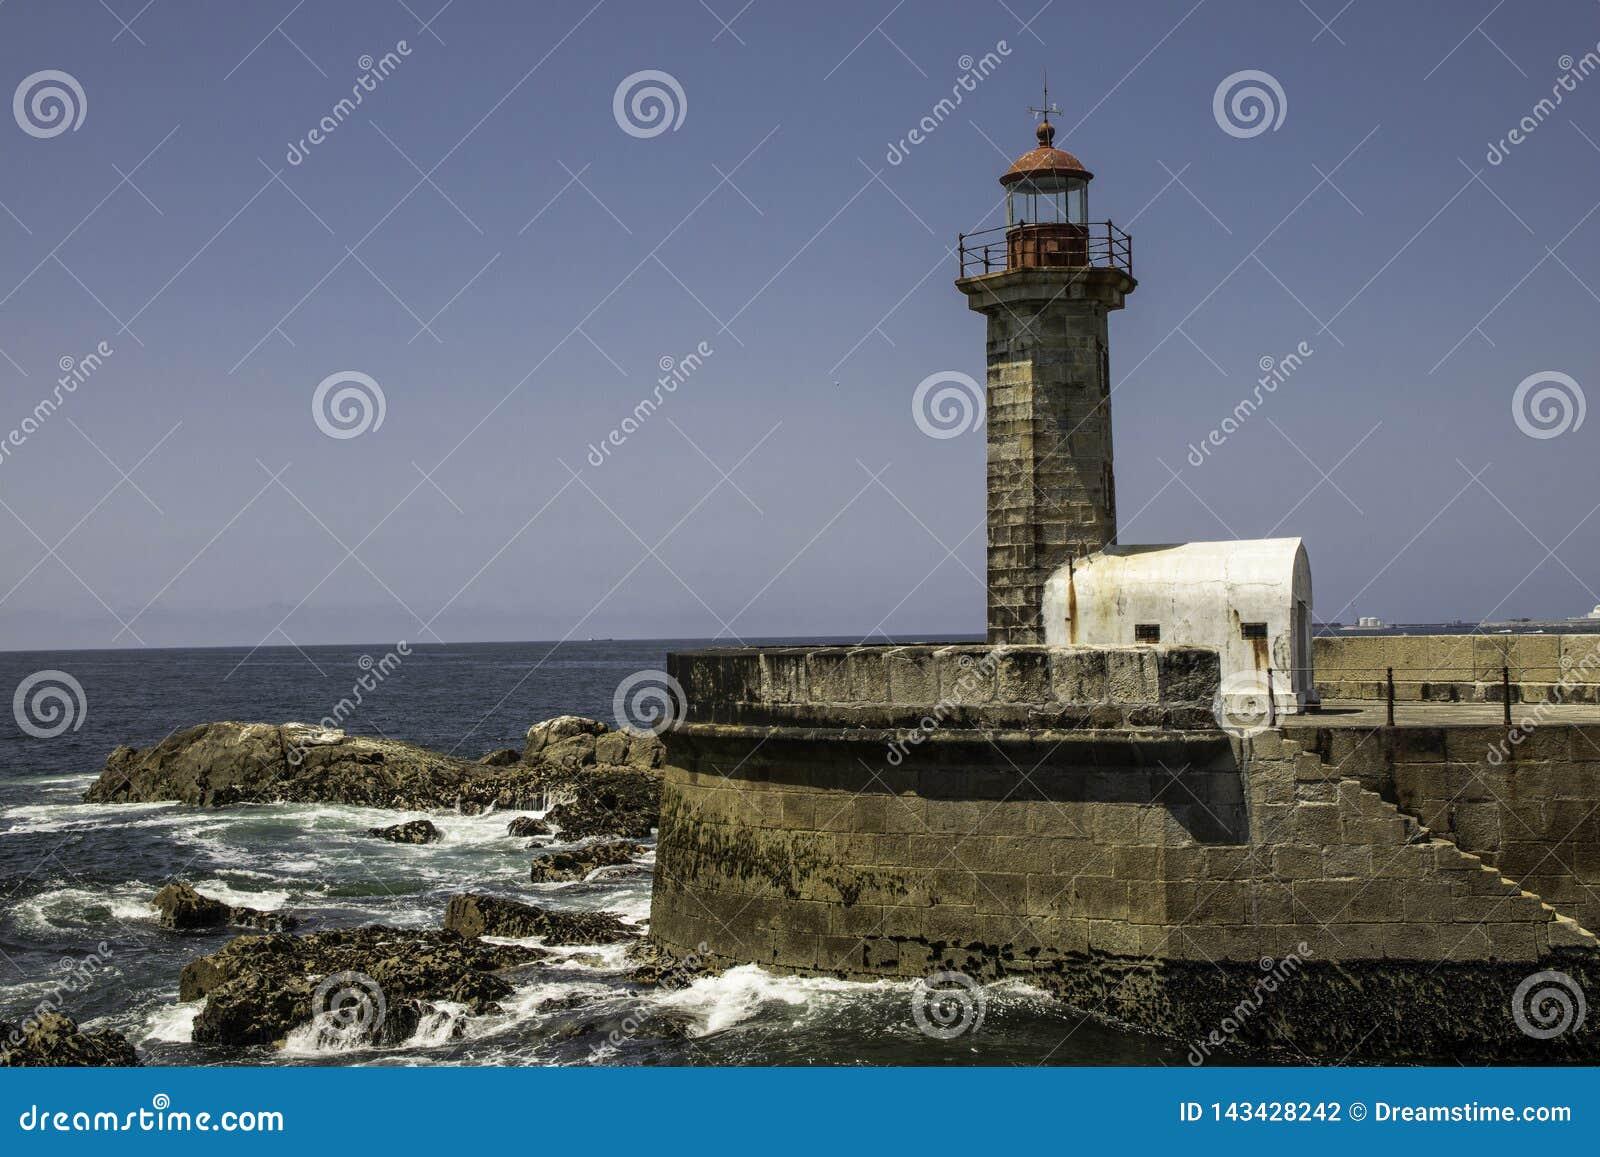 Signalleuchtturm am Eingang des Duero-Flusses in Oporto in Portugal